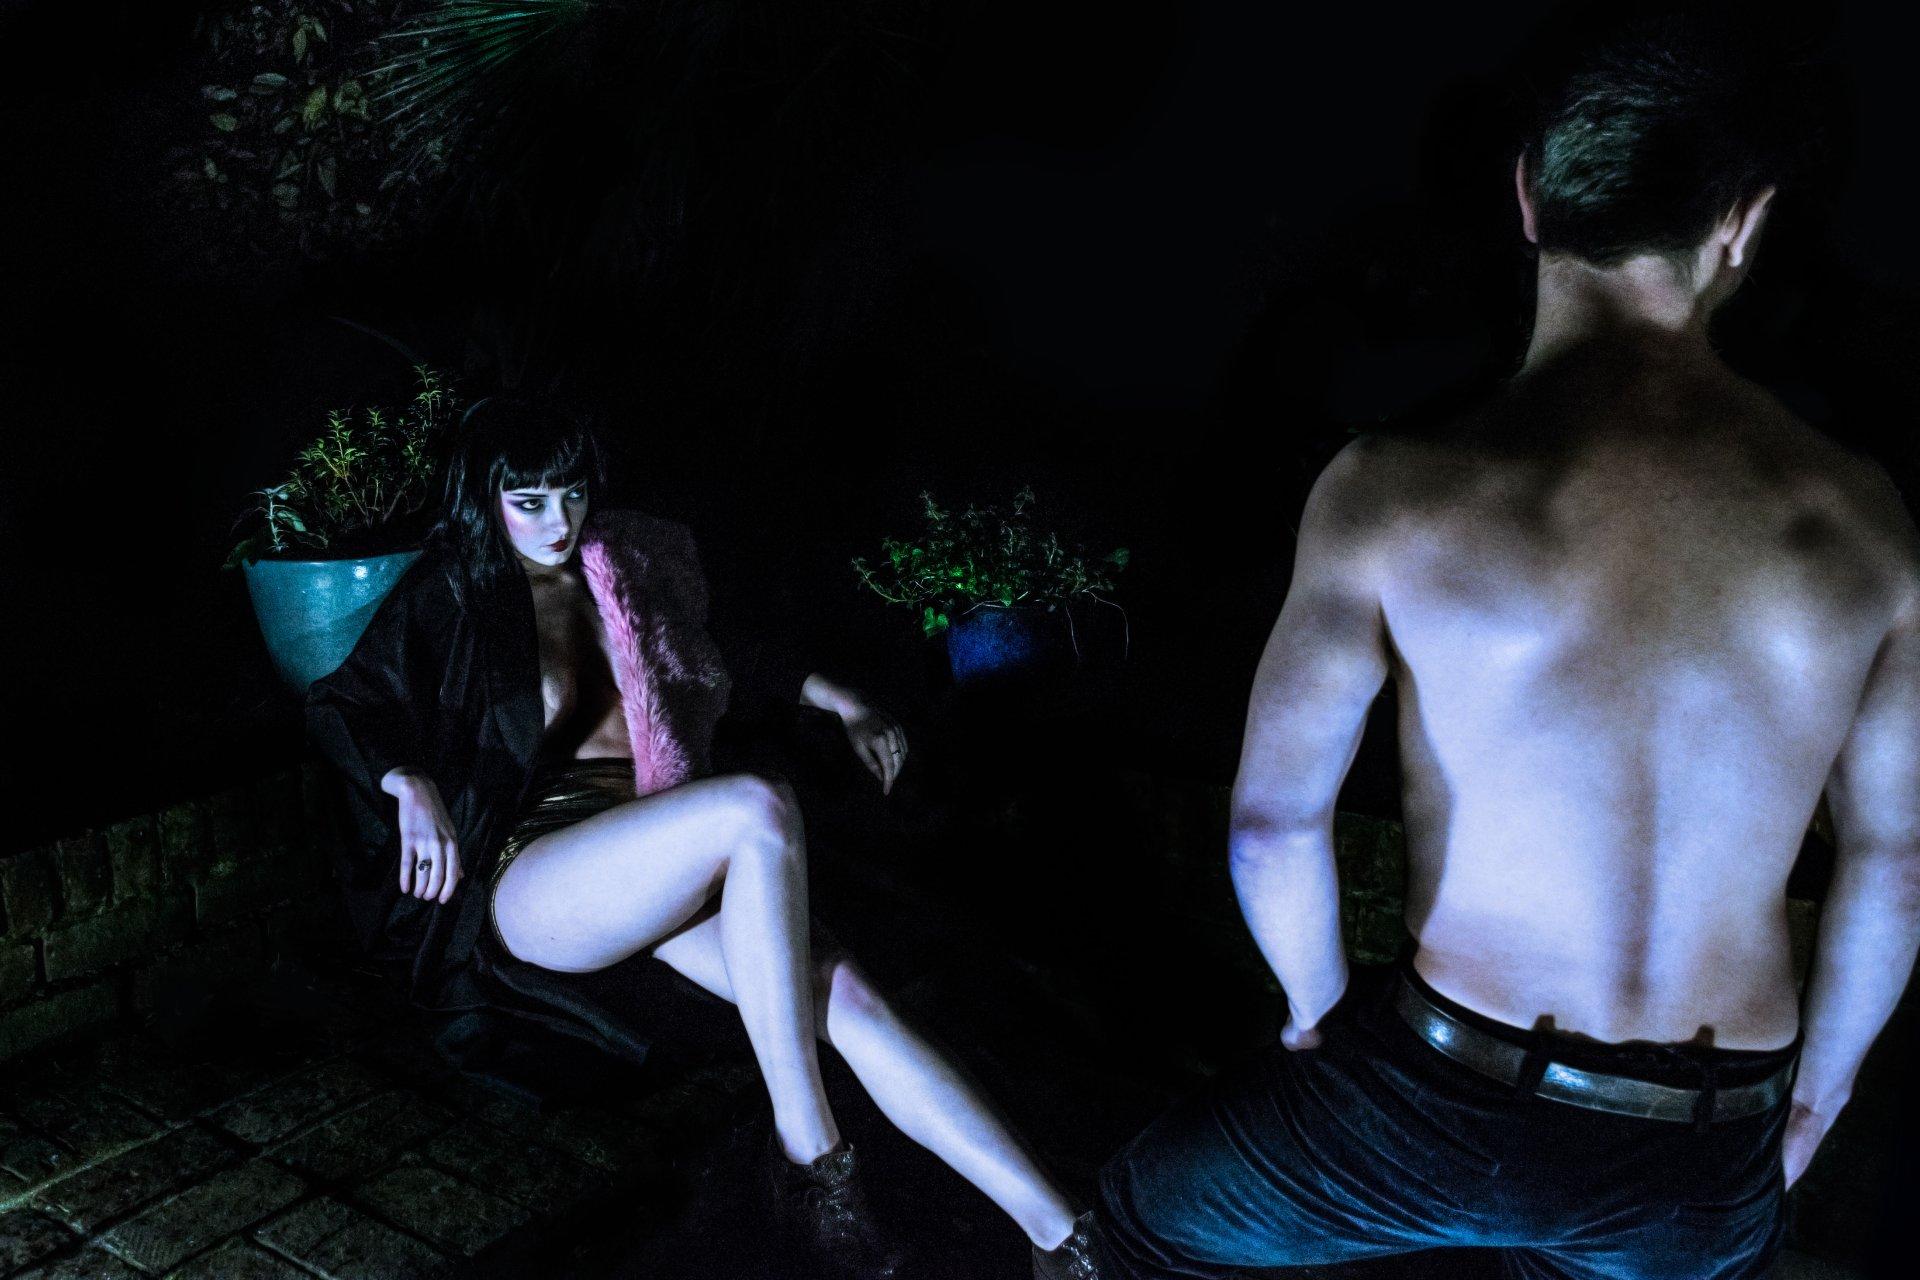 Dakota blue richards nude photos